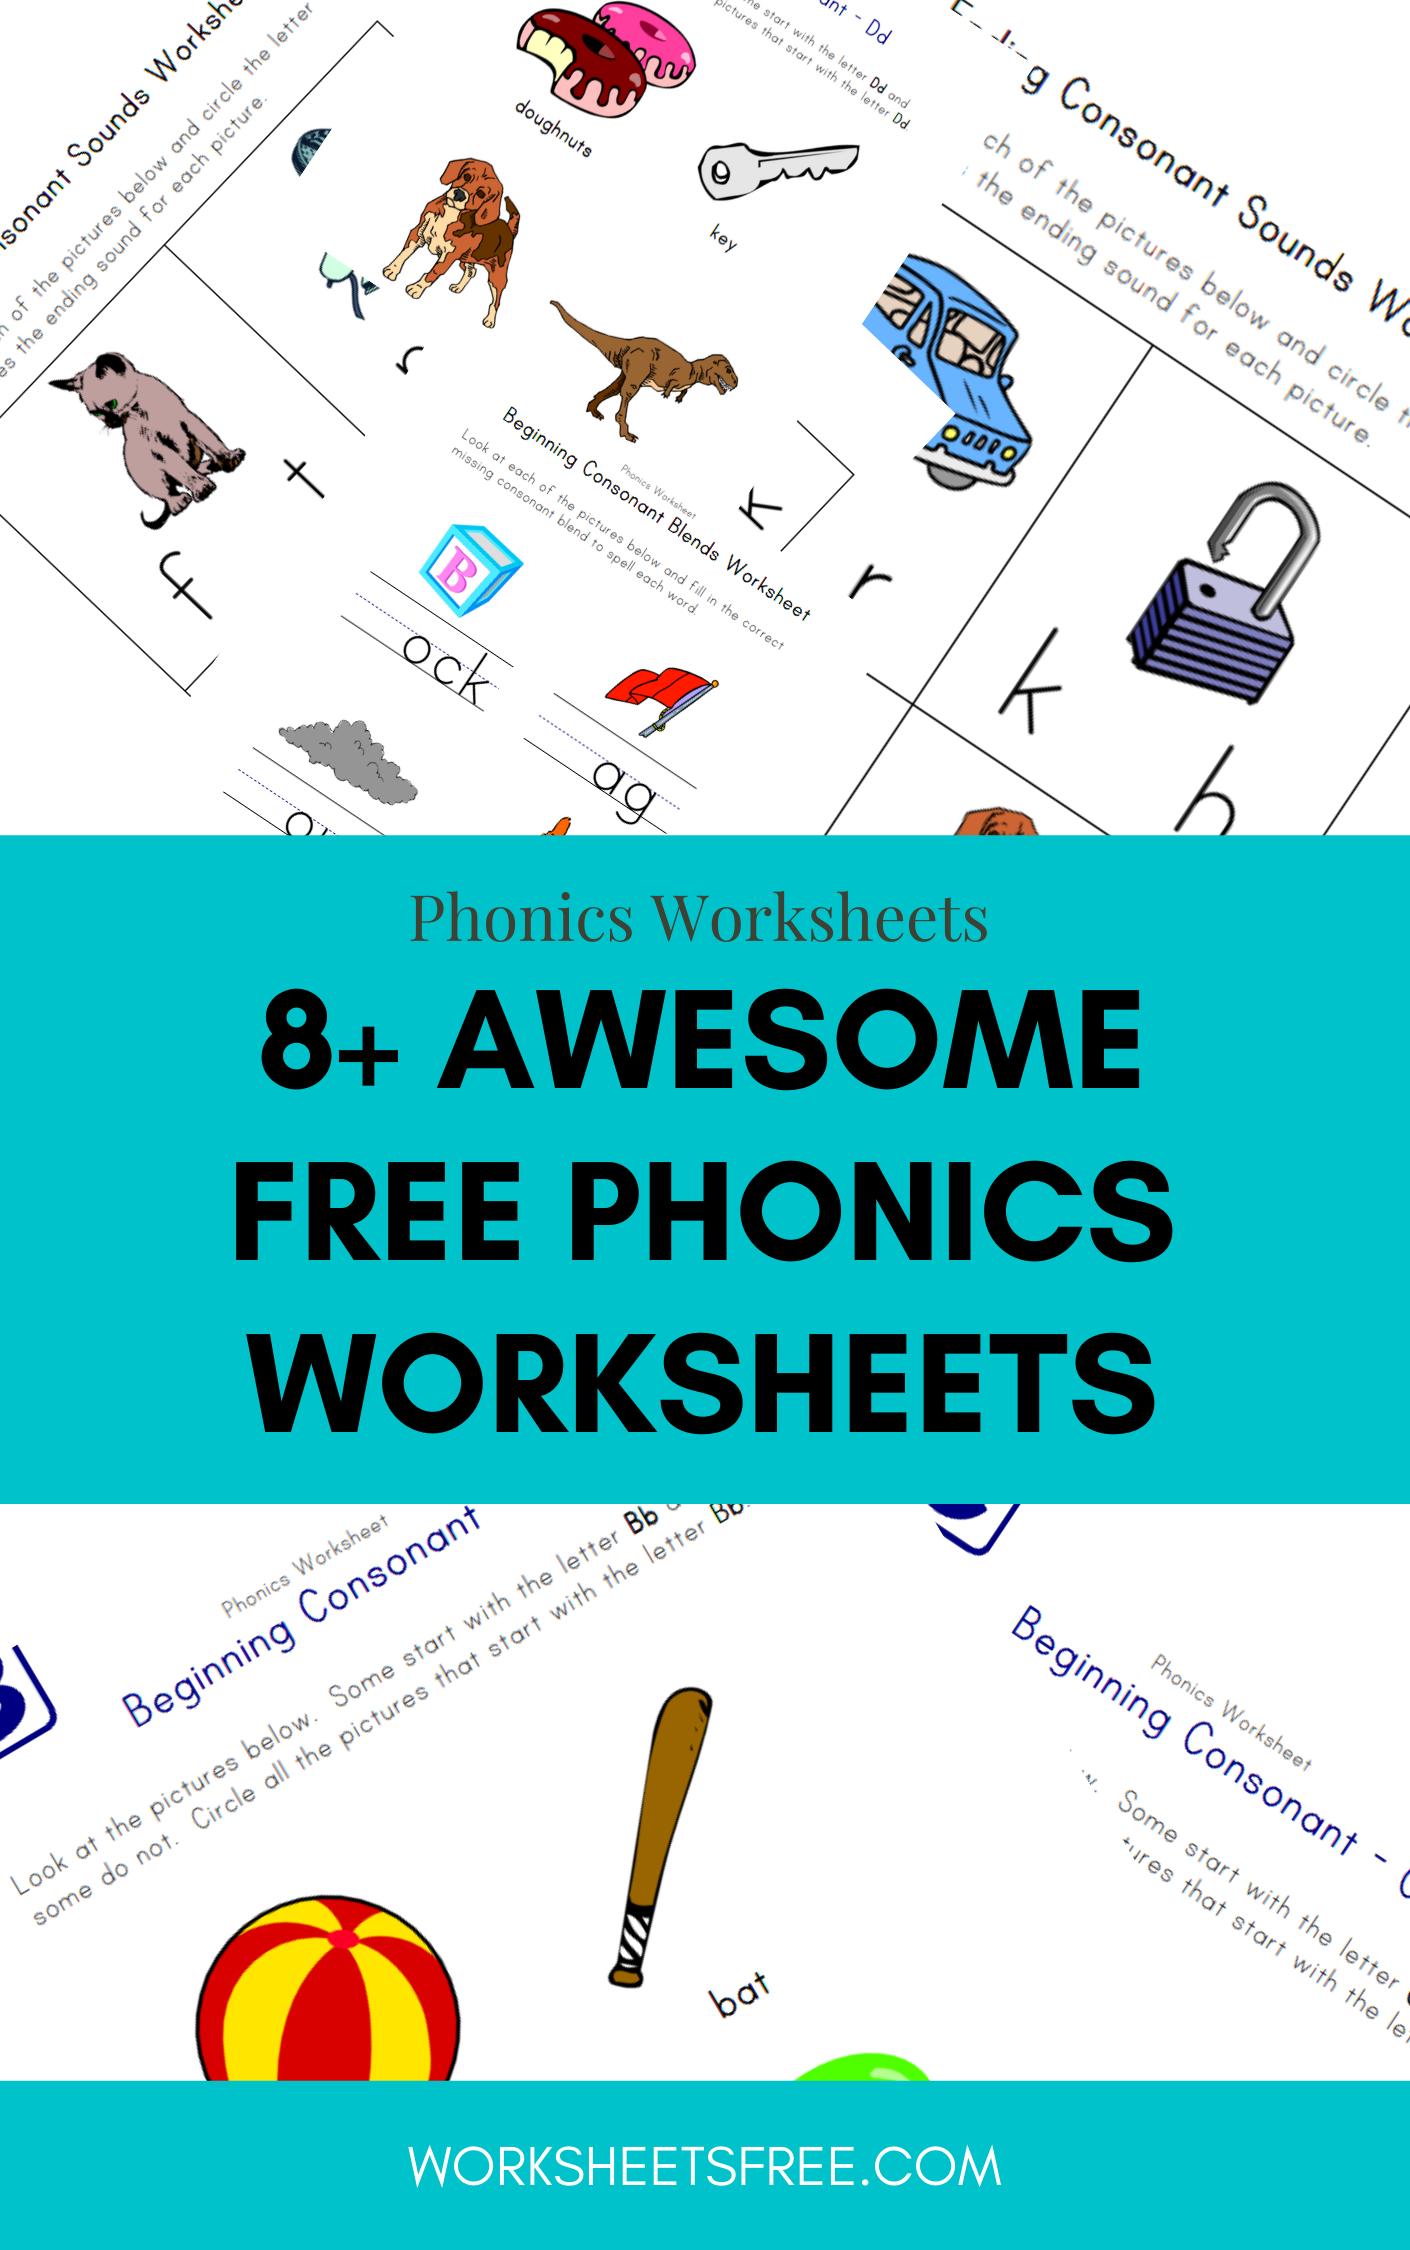 8 Awesome Free Phonics Worksheets 8 Awesome Free Phonics Worksheets Phonics Worksheets Free Phonics Free Phonics Worksheets [ 2250 x 1410 Pixel ]